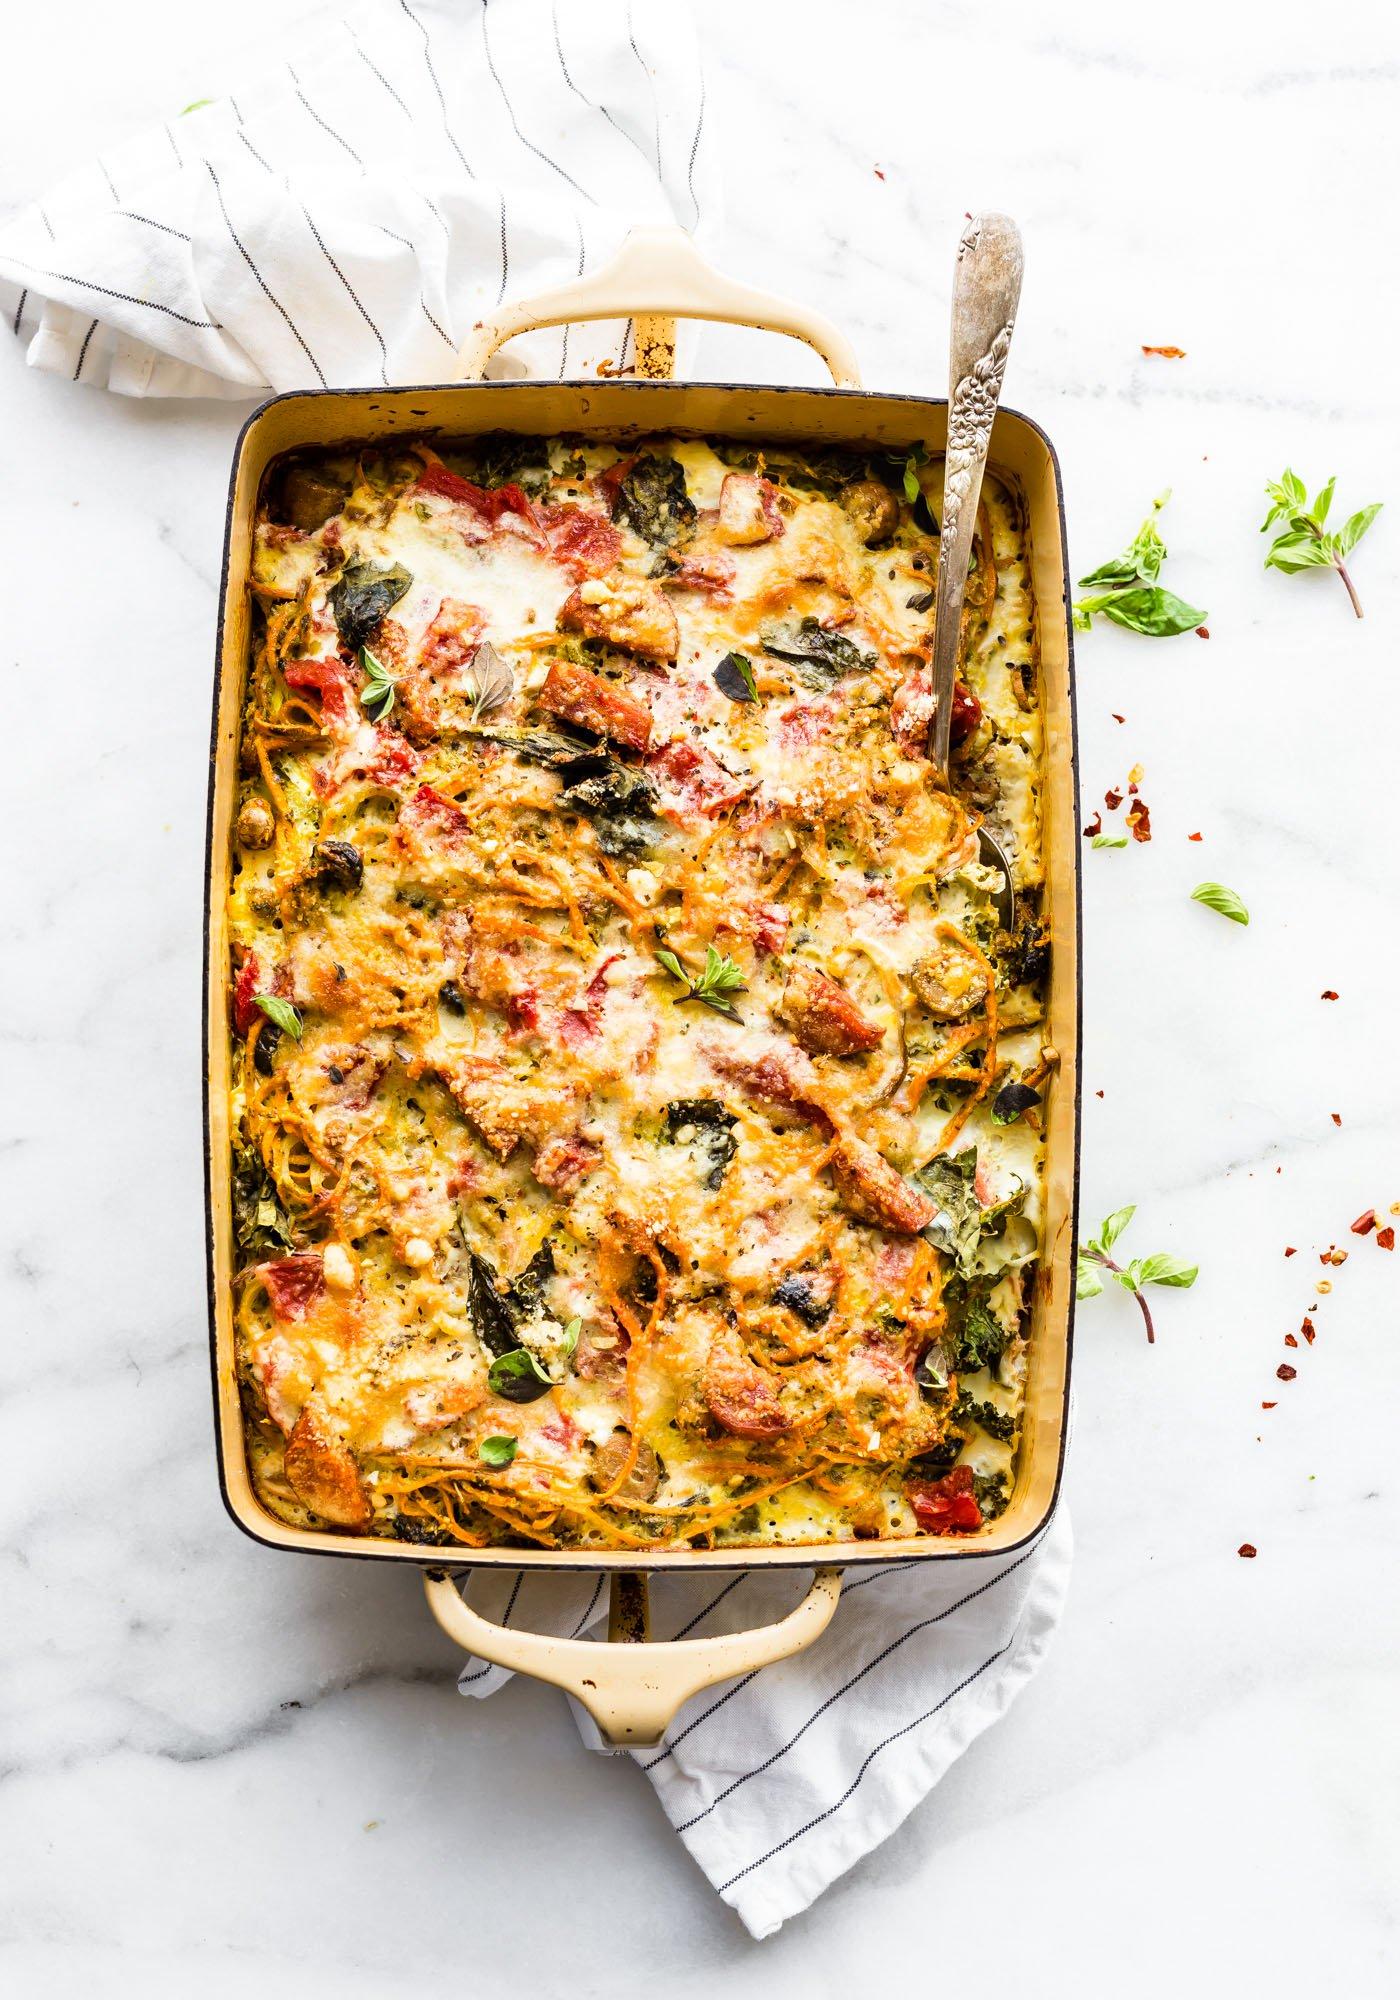 Spiralized Sweet Potato Spaghetti Casserole from cottercrunch.com on foodiecrush.com